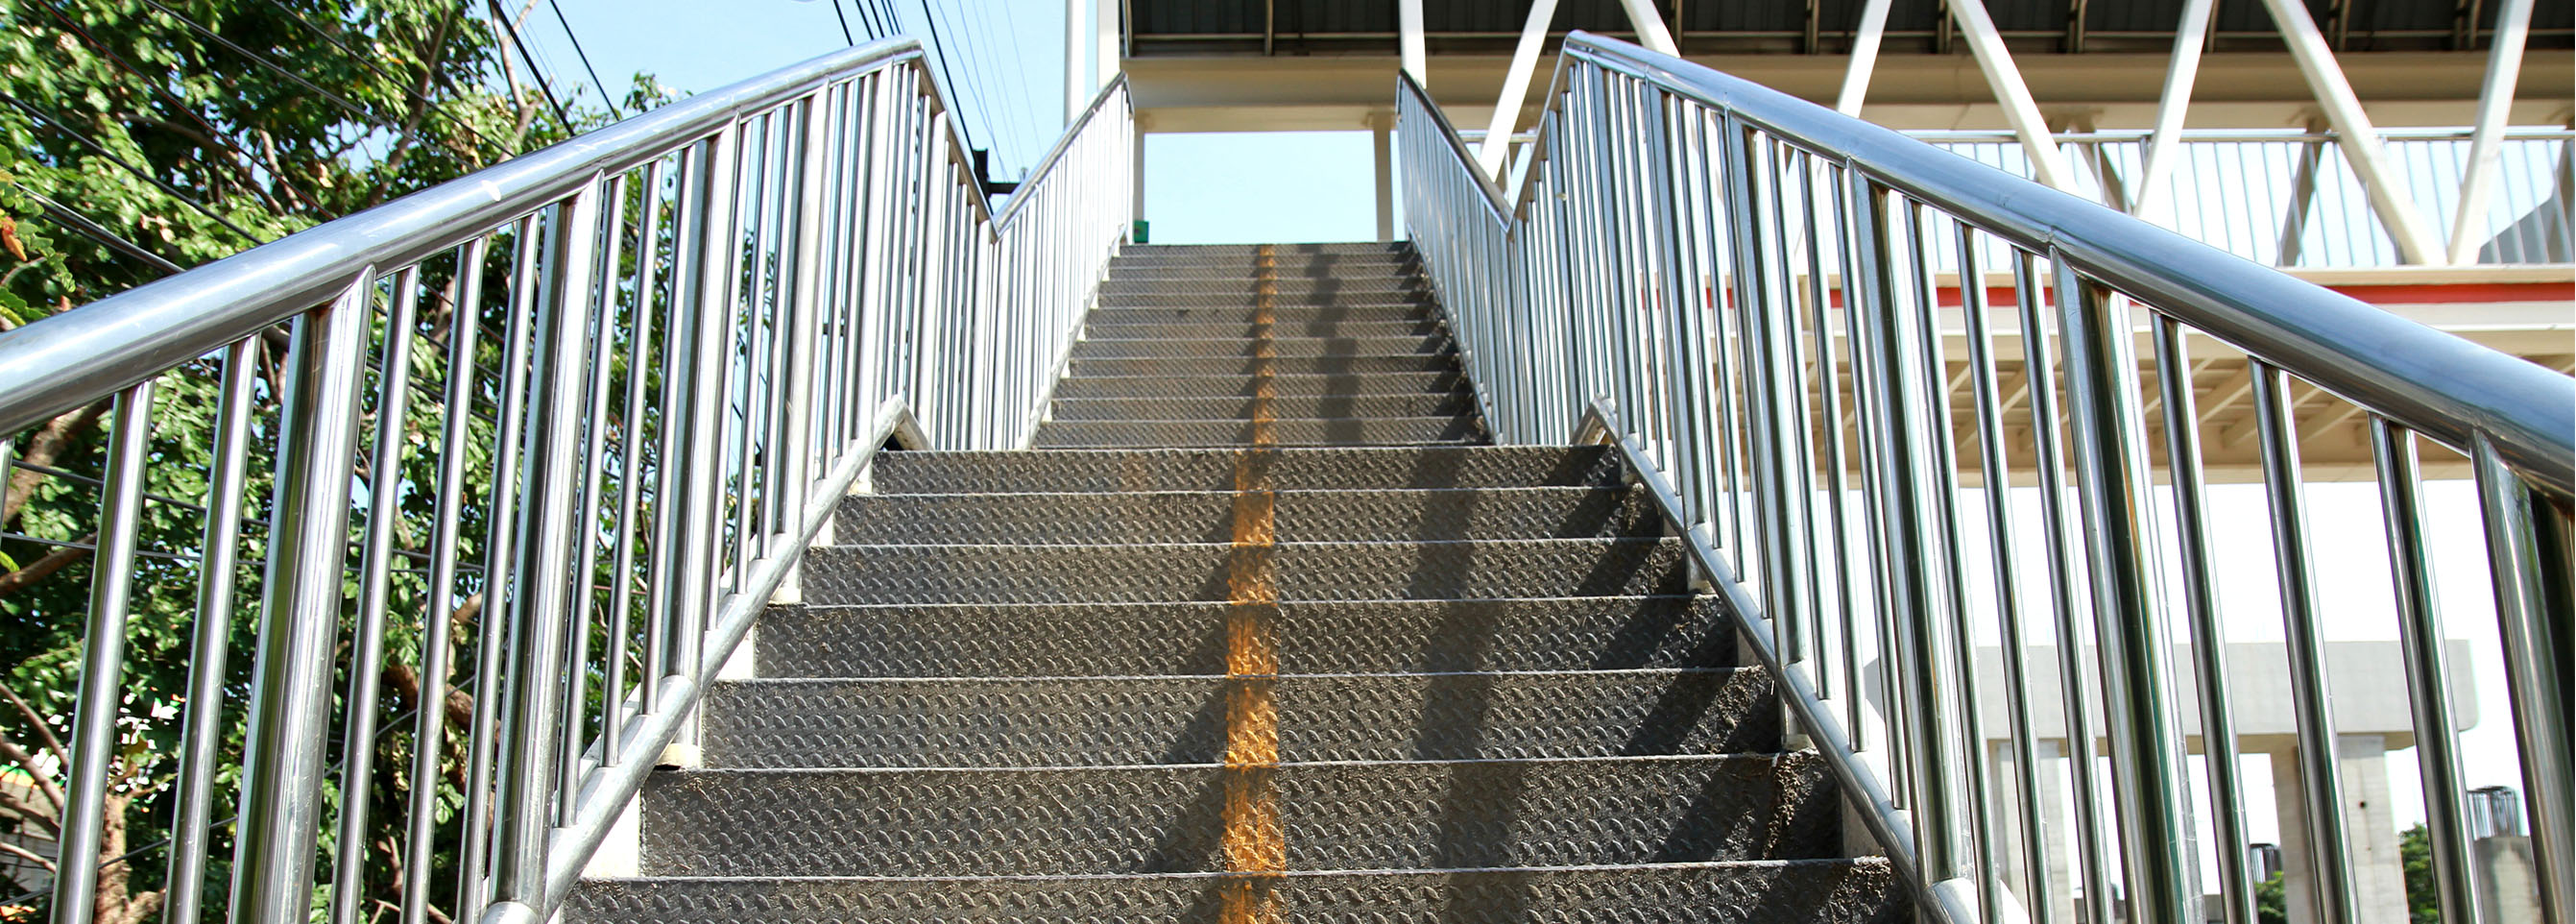 Slip and Falls/Premises Liability